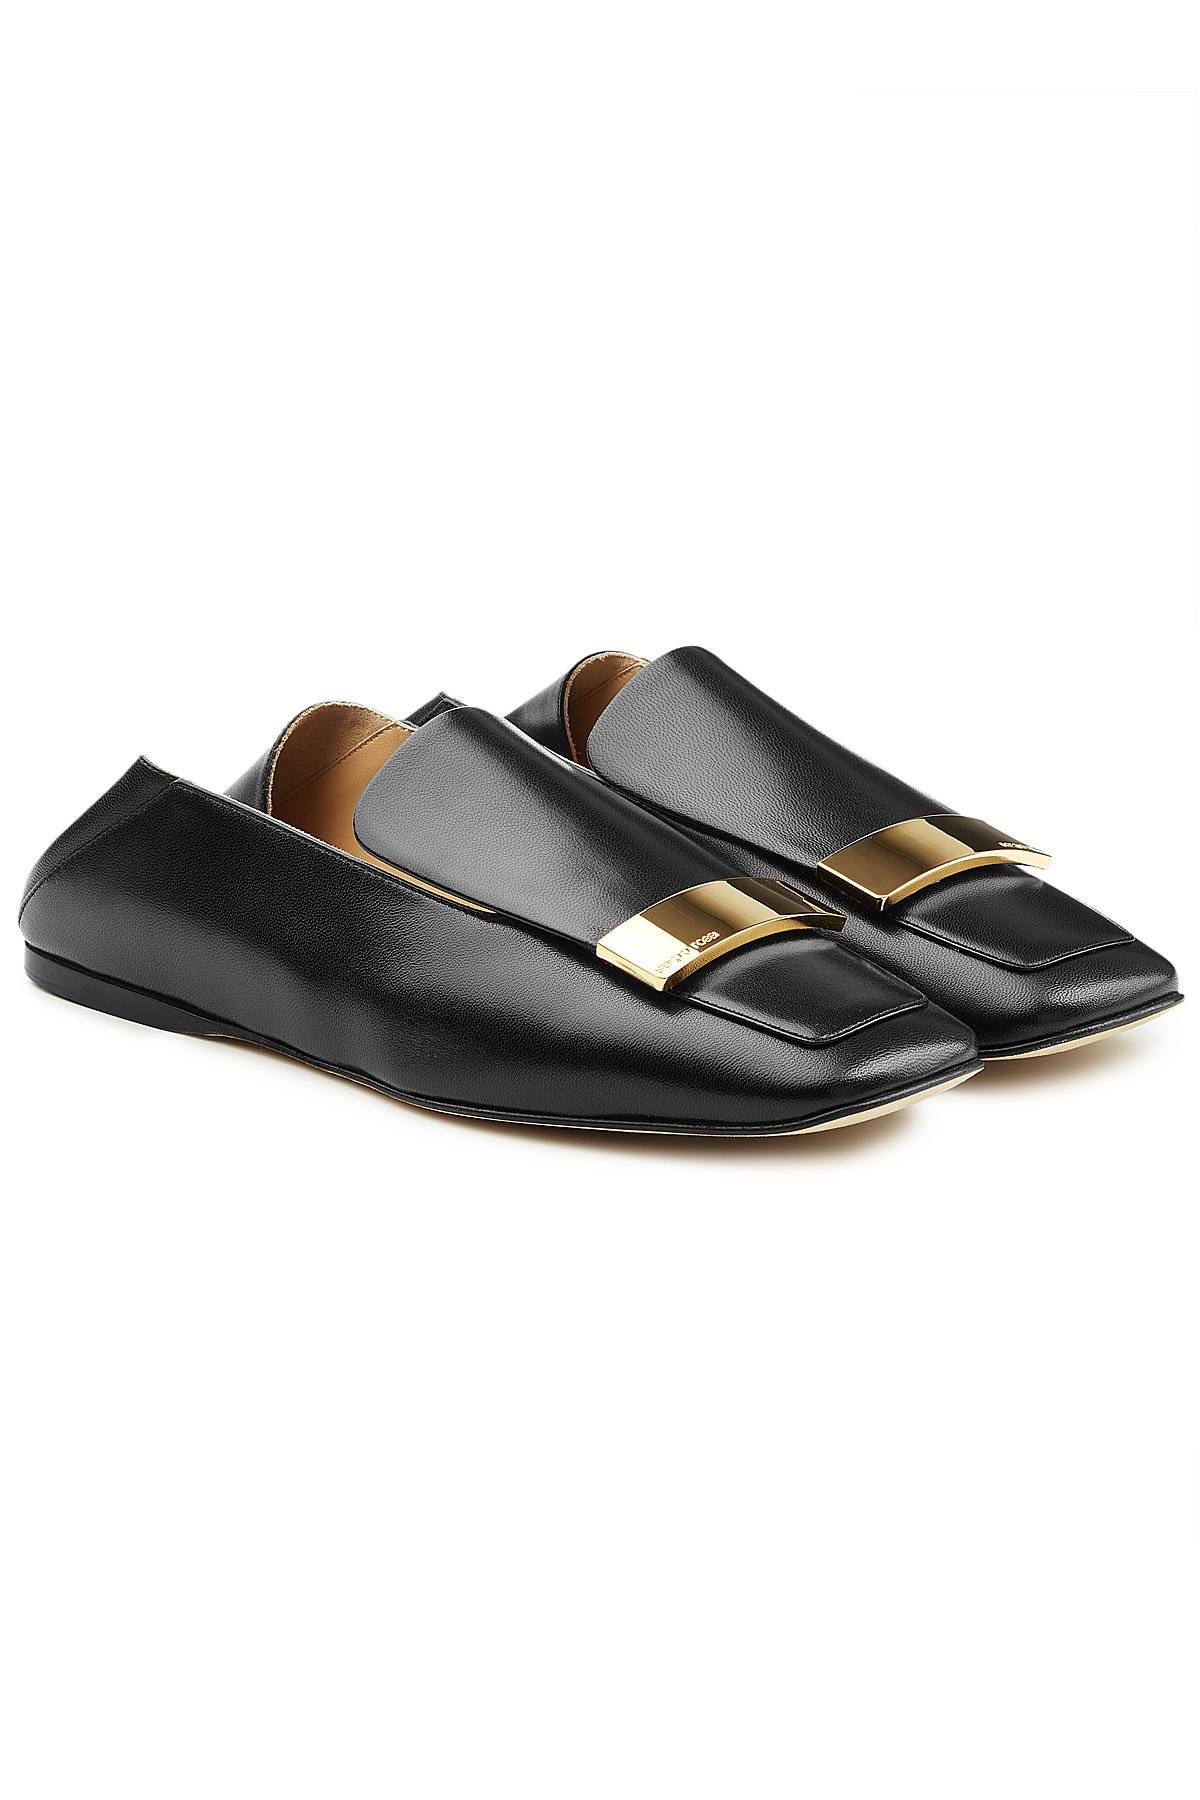 Jil Sander Leather Shoes with Triple Monk Straps Gr. IT 37 4W9uTbRc